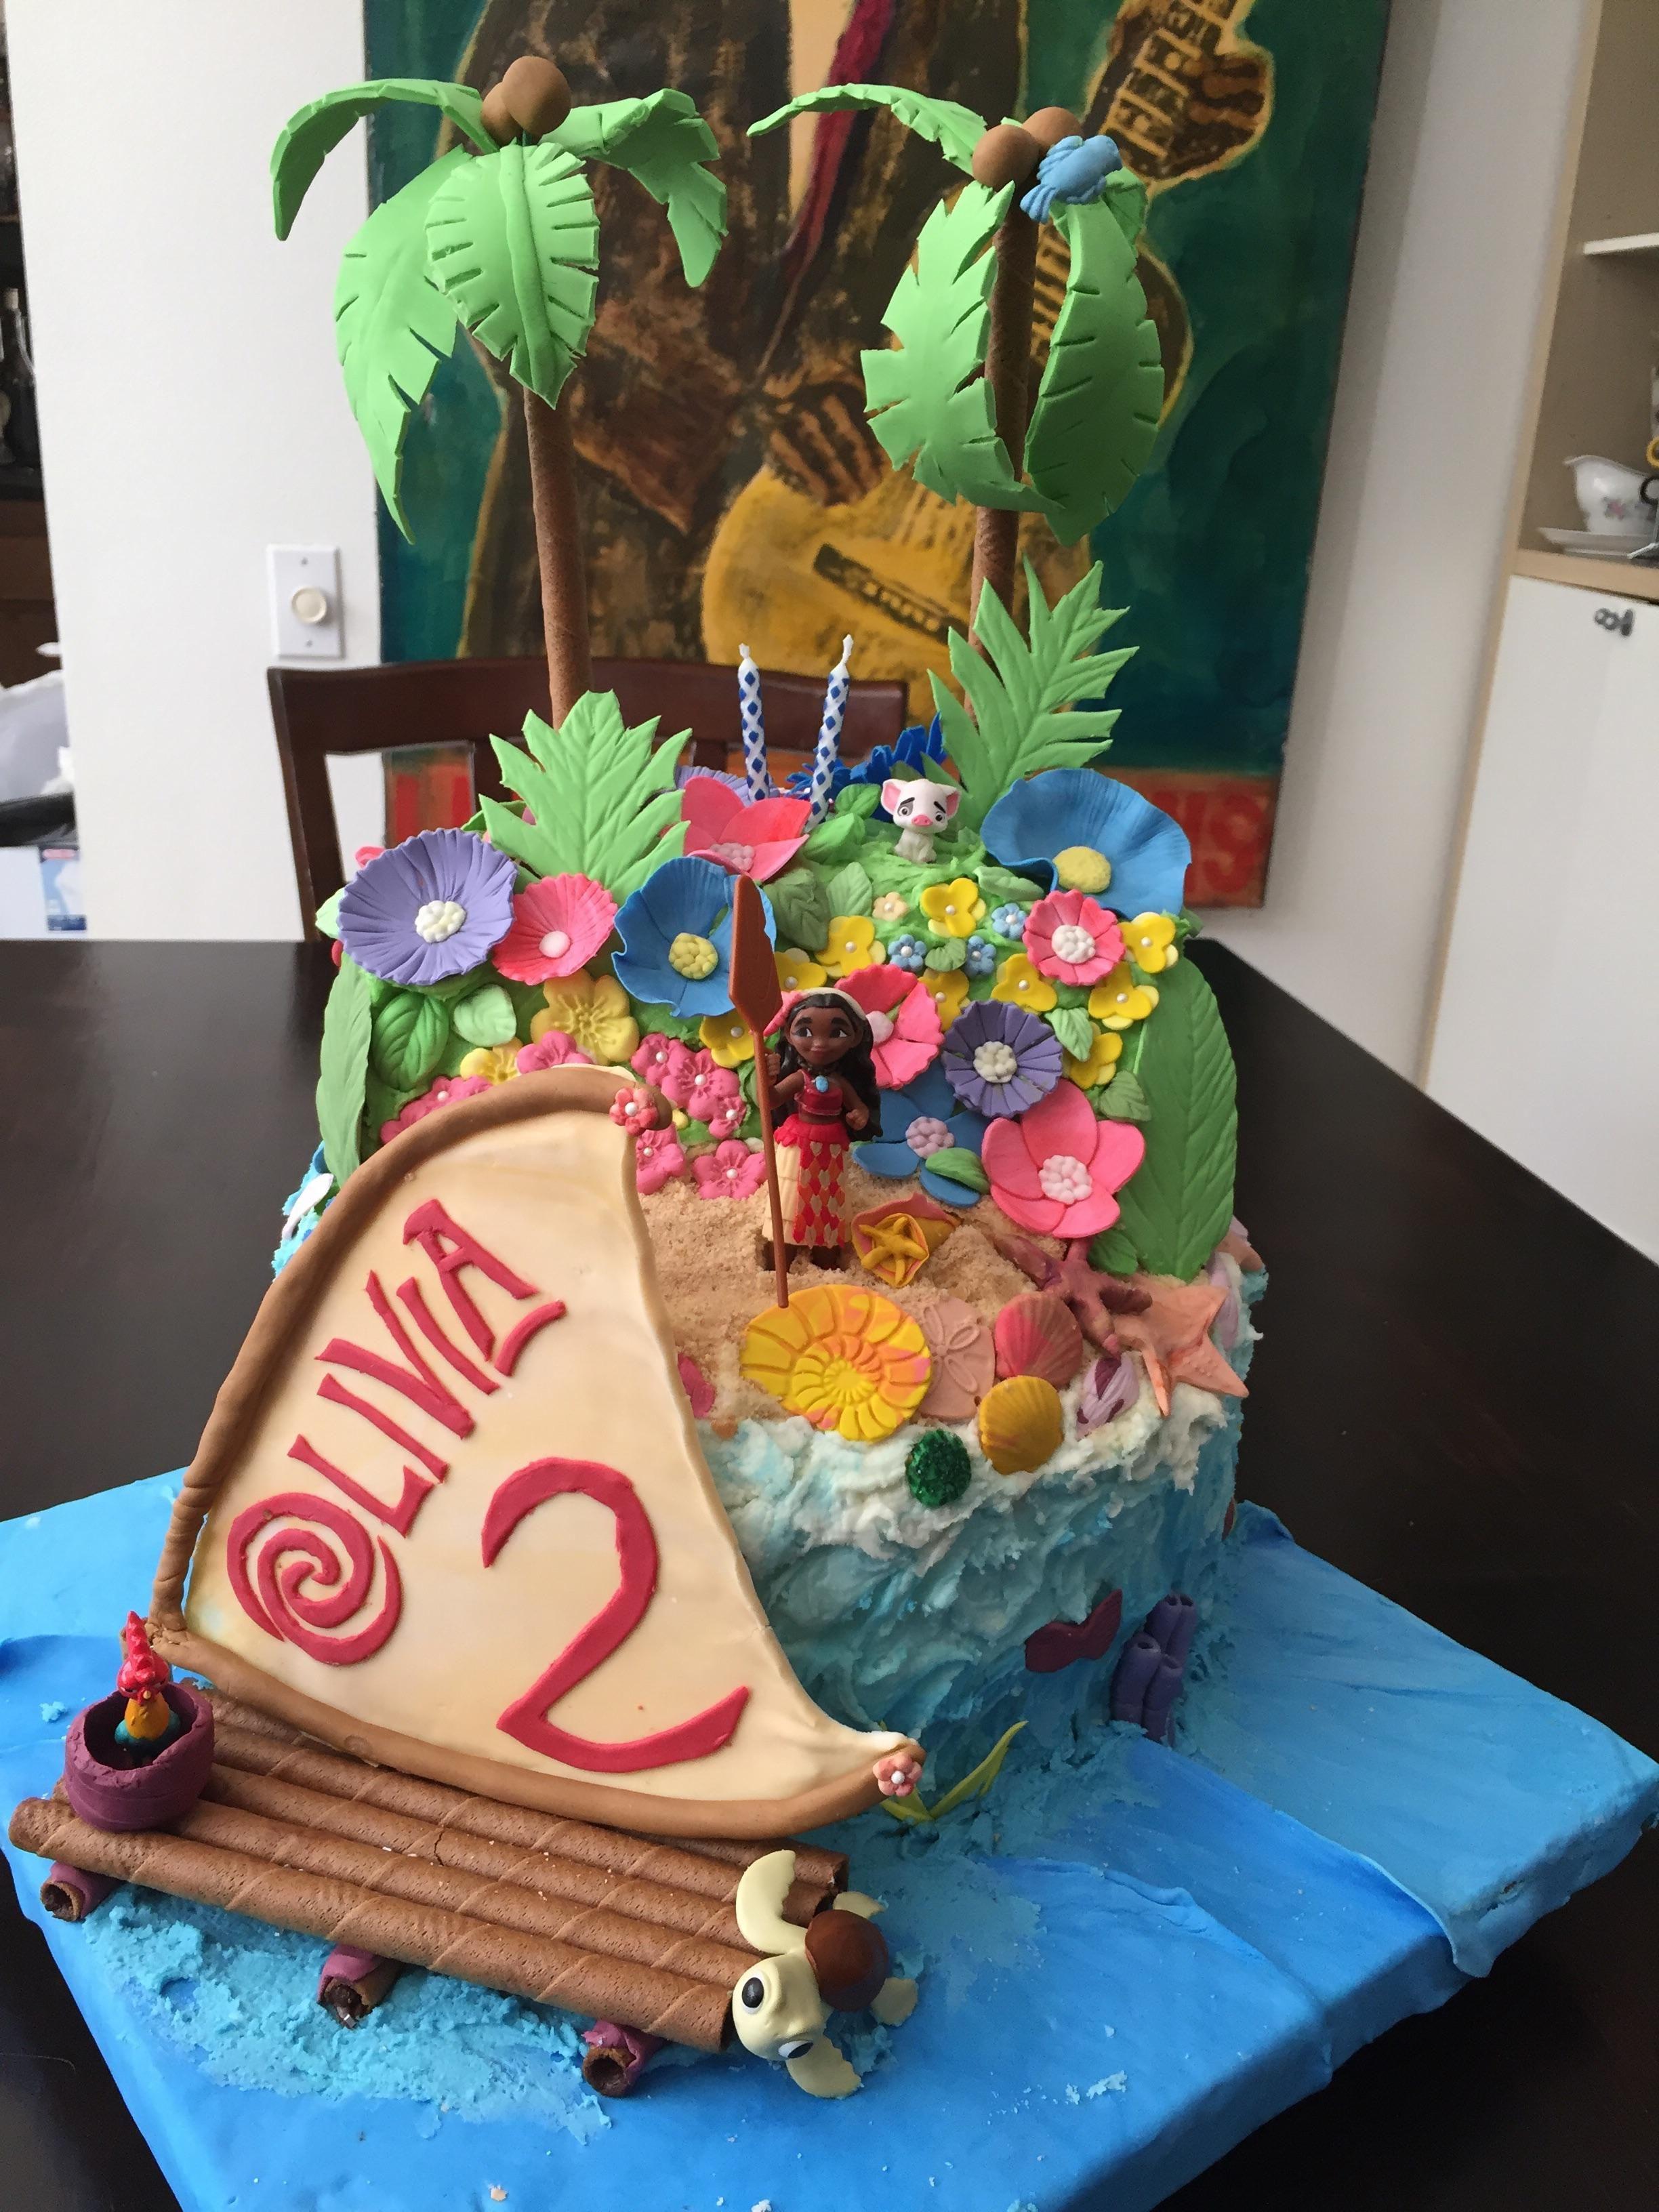 Enjoyable Moana Cake For My Friends 2 Year Old 2 Year Old Birthday Funny Birthday Cards Online Inifodamsfinfo